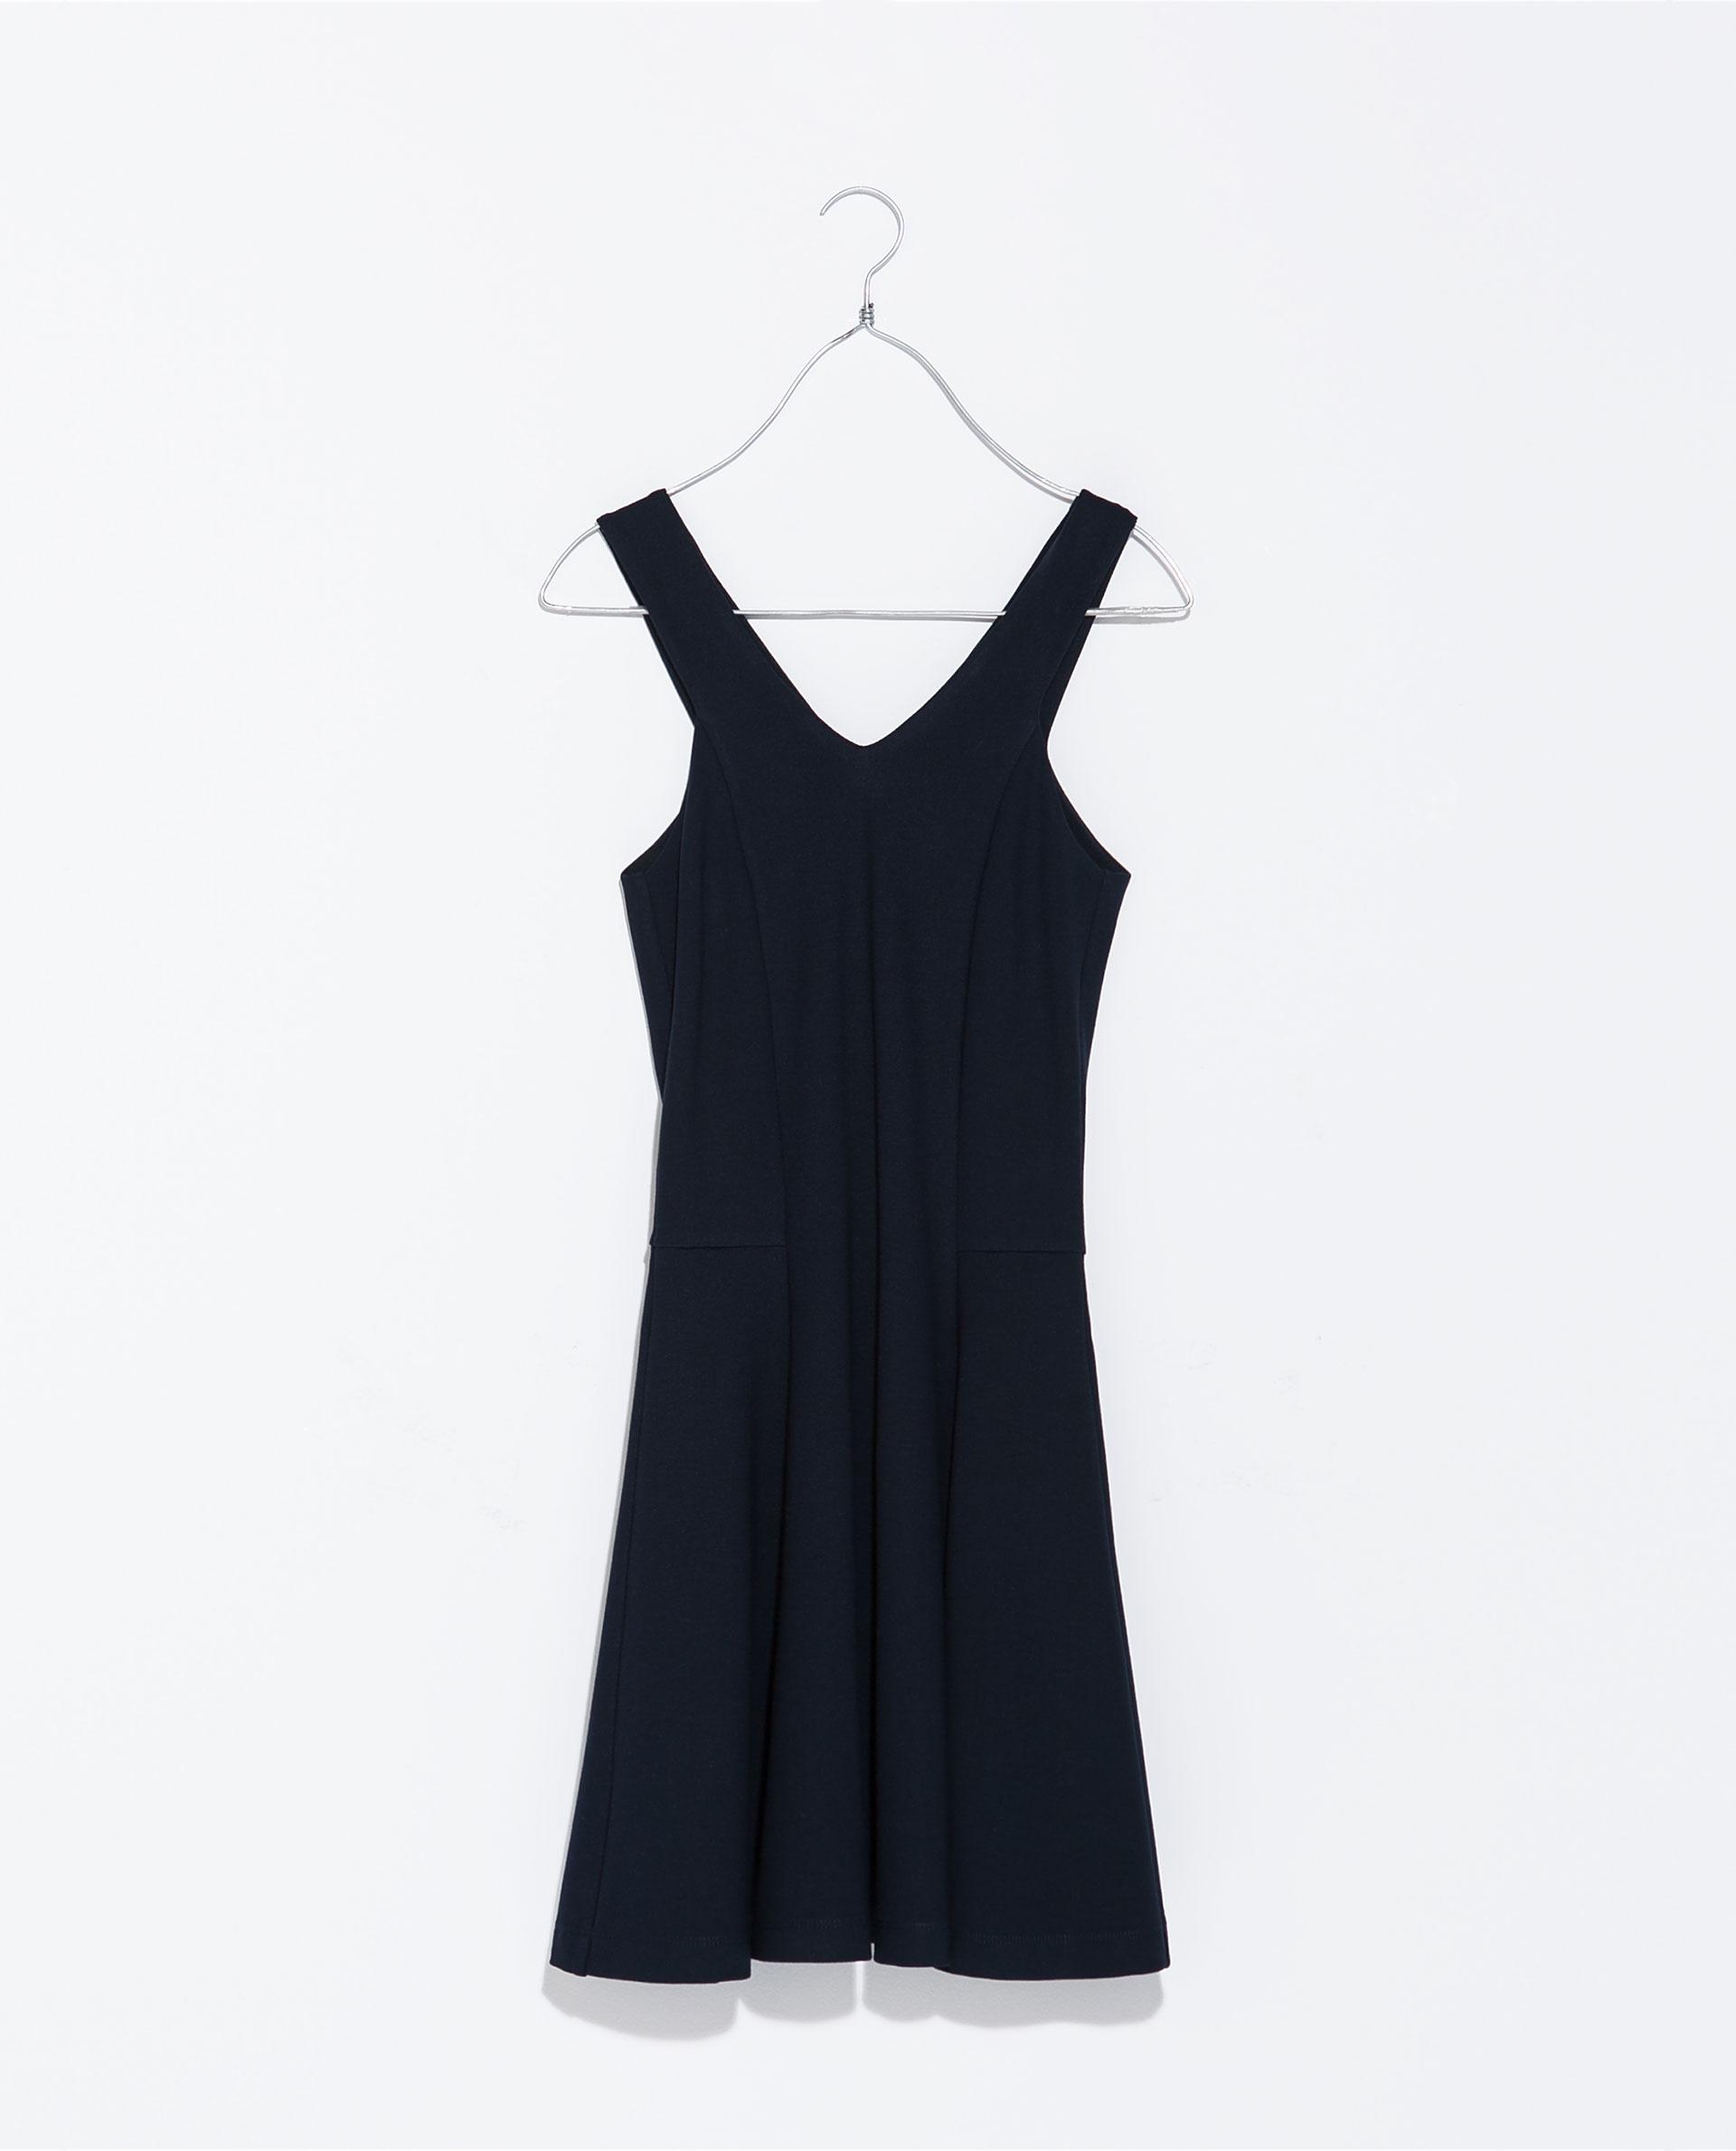 Zara Navy Blue Dress With Pencil Skirt 24